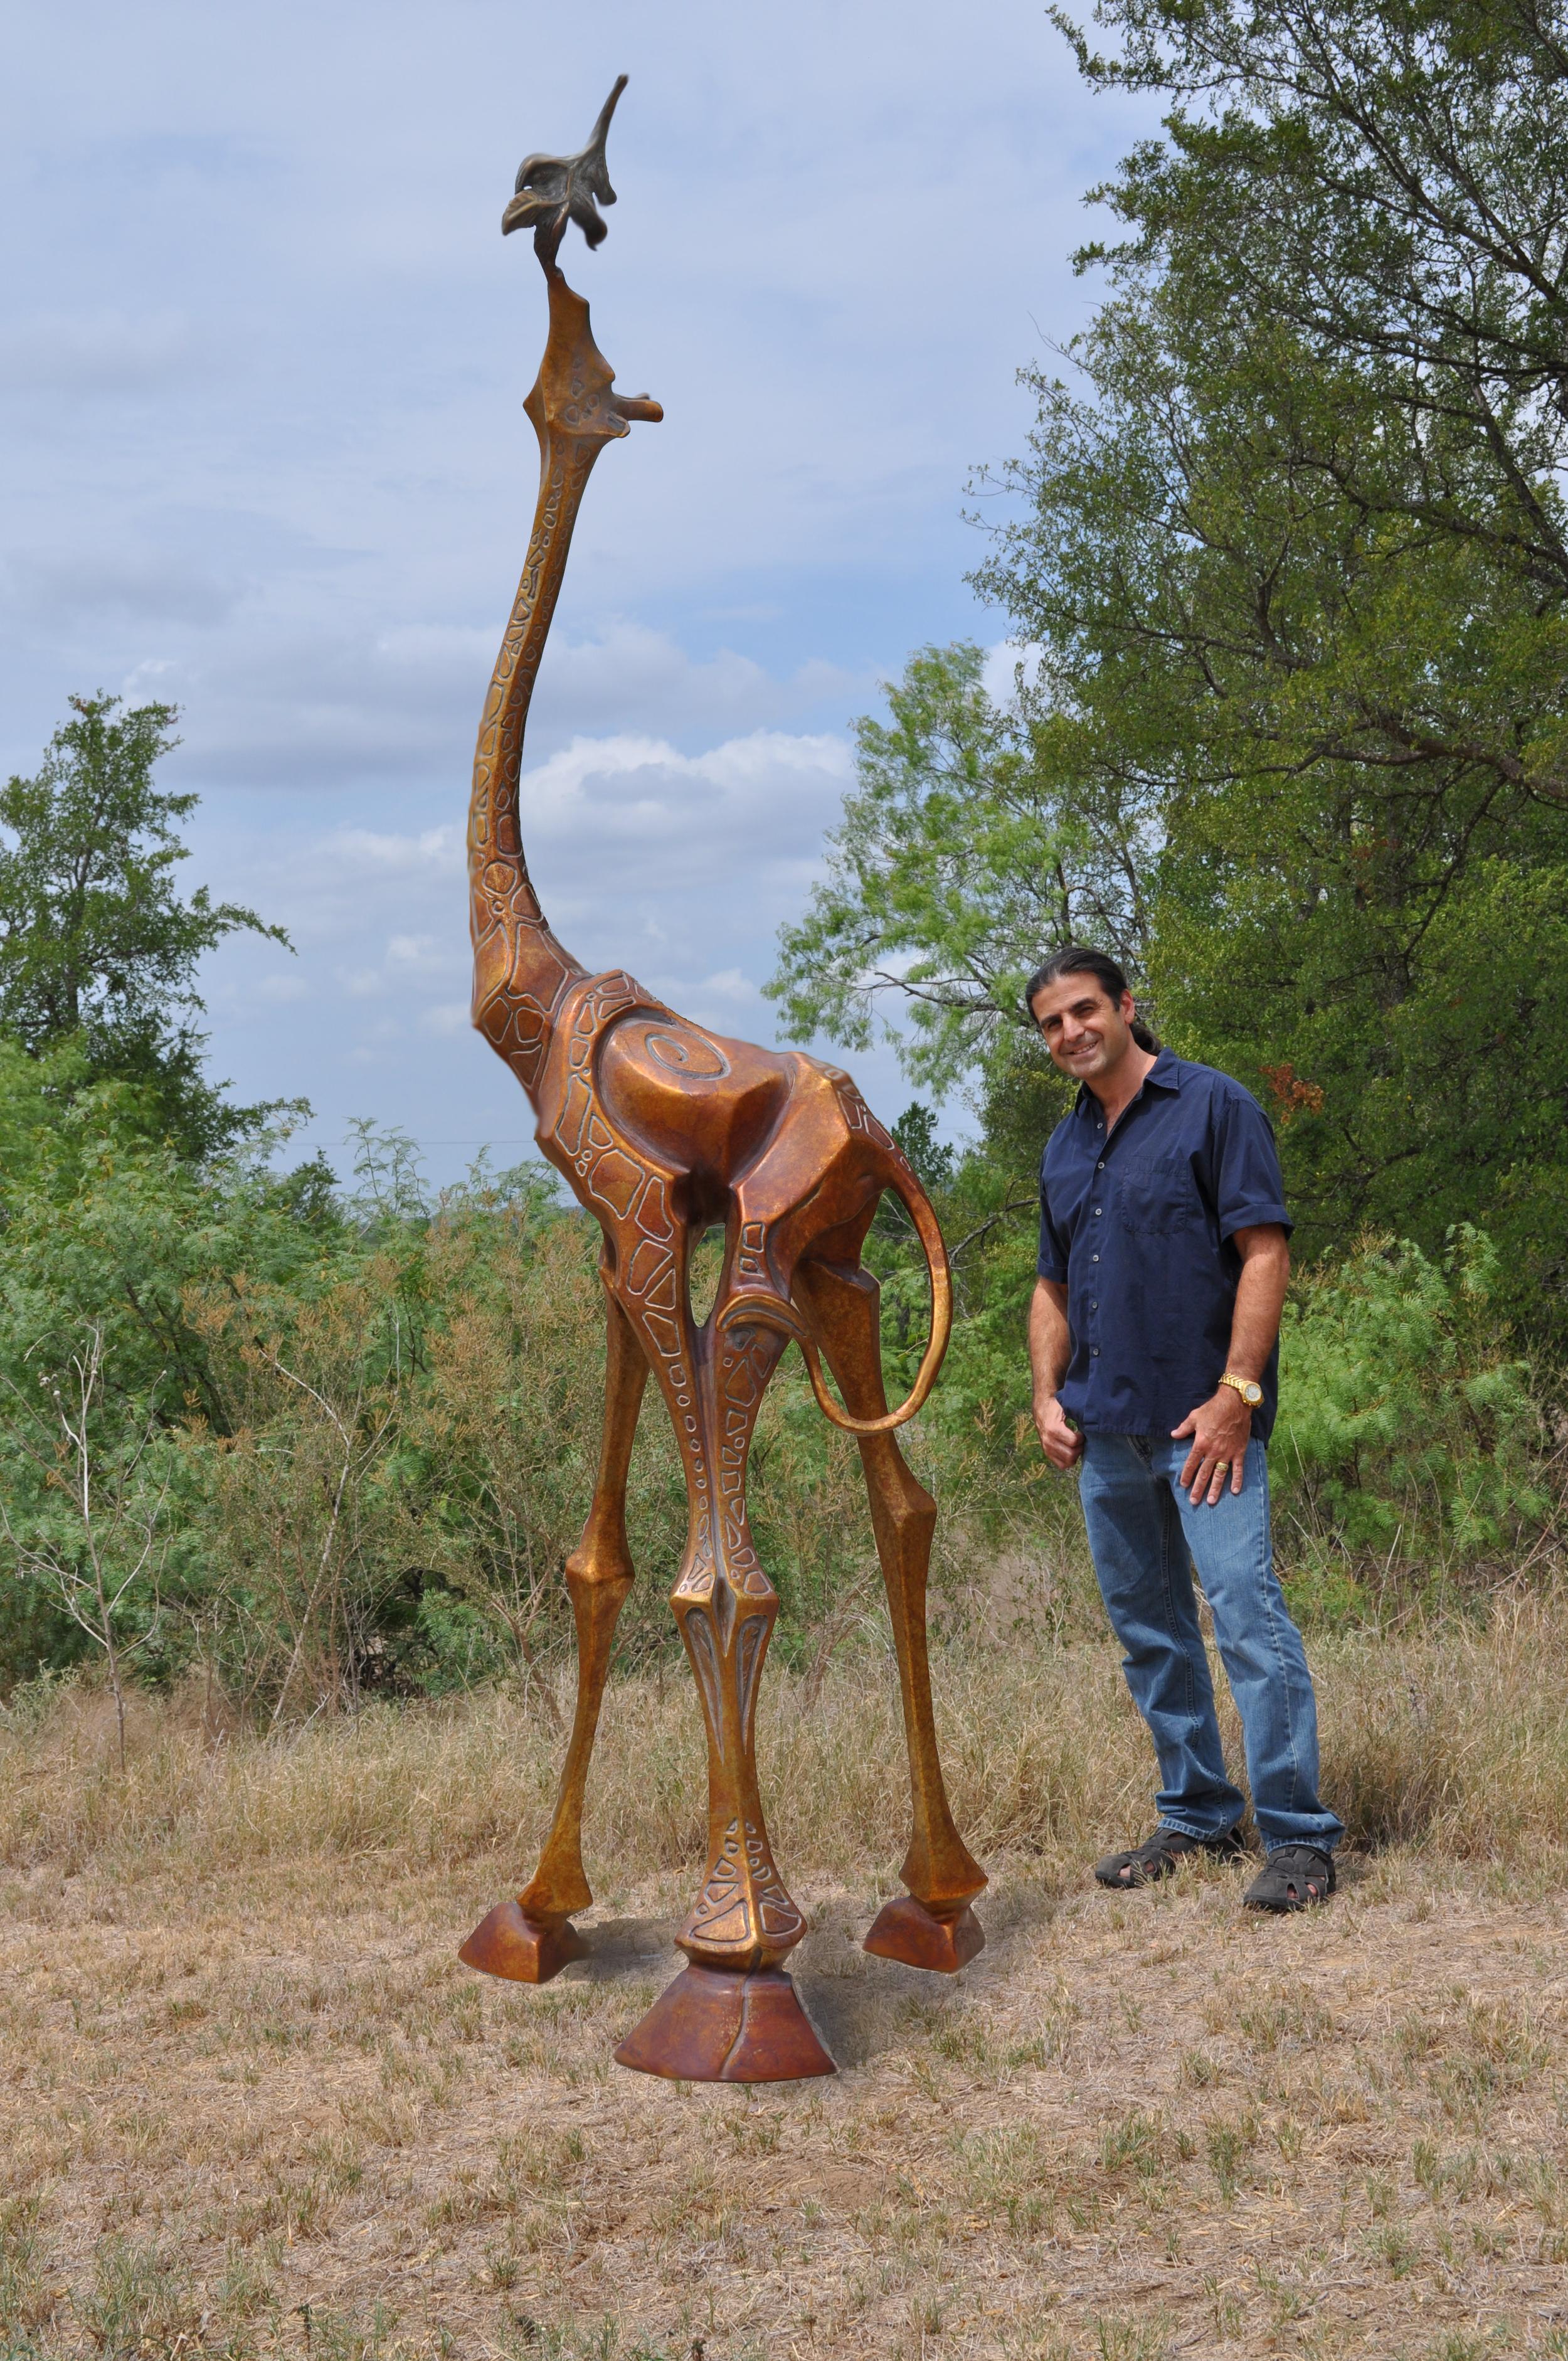 Giraffe Bronze Sculpture Monument by John Maisano